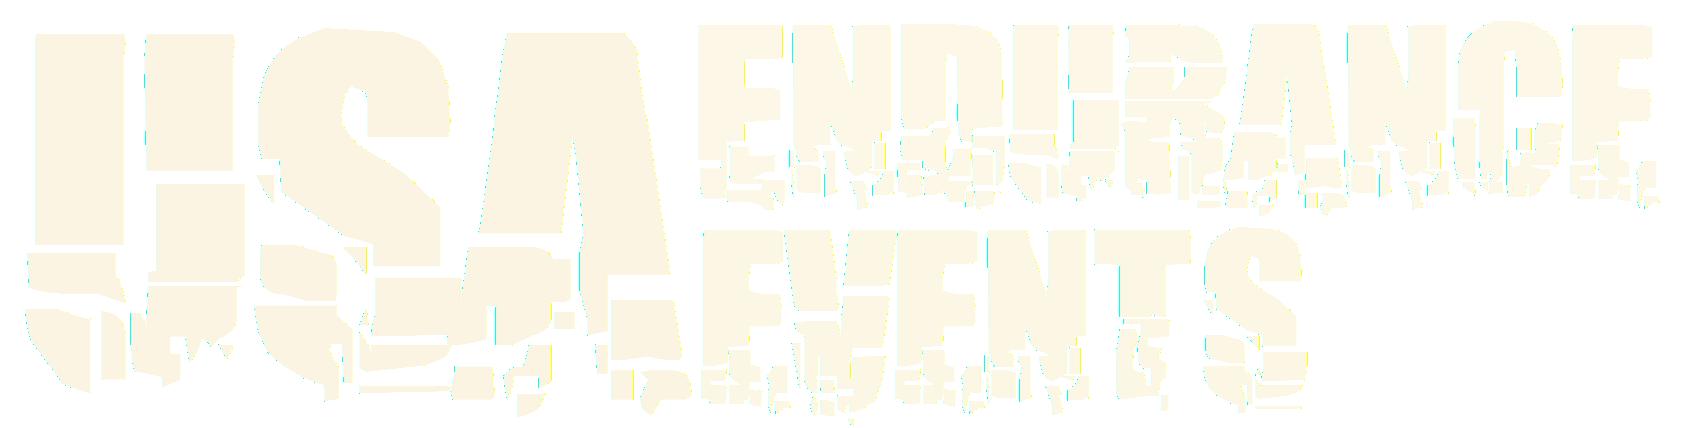 usa endurance events logo png 1.png